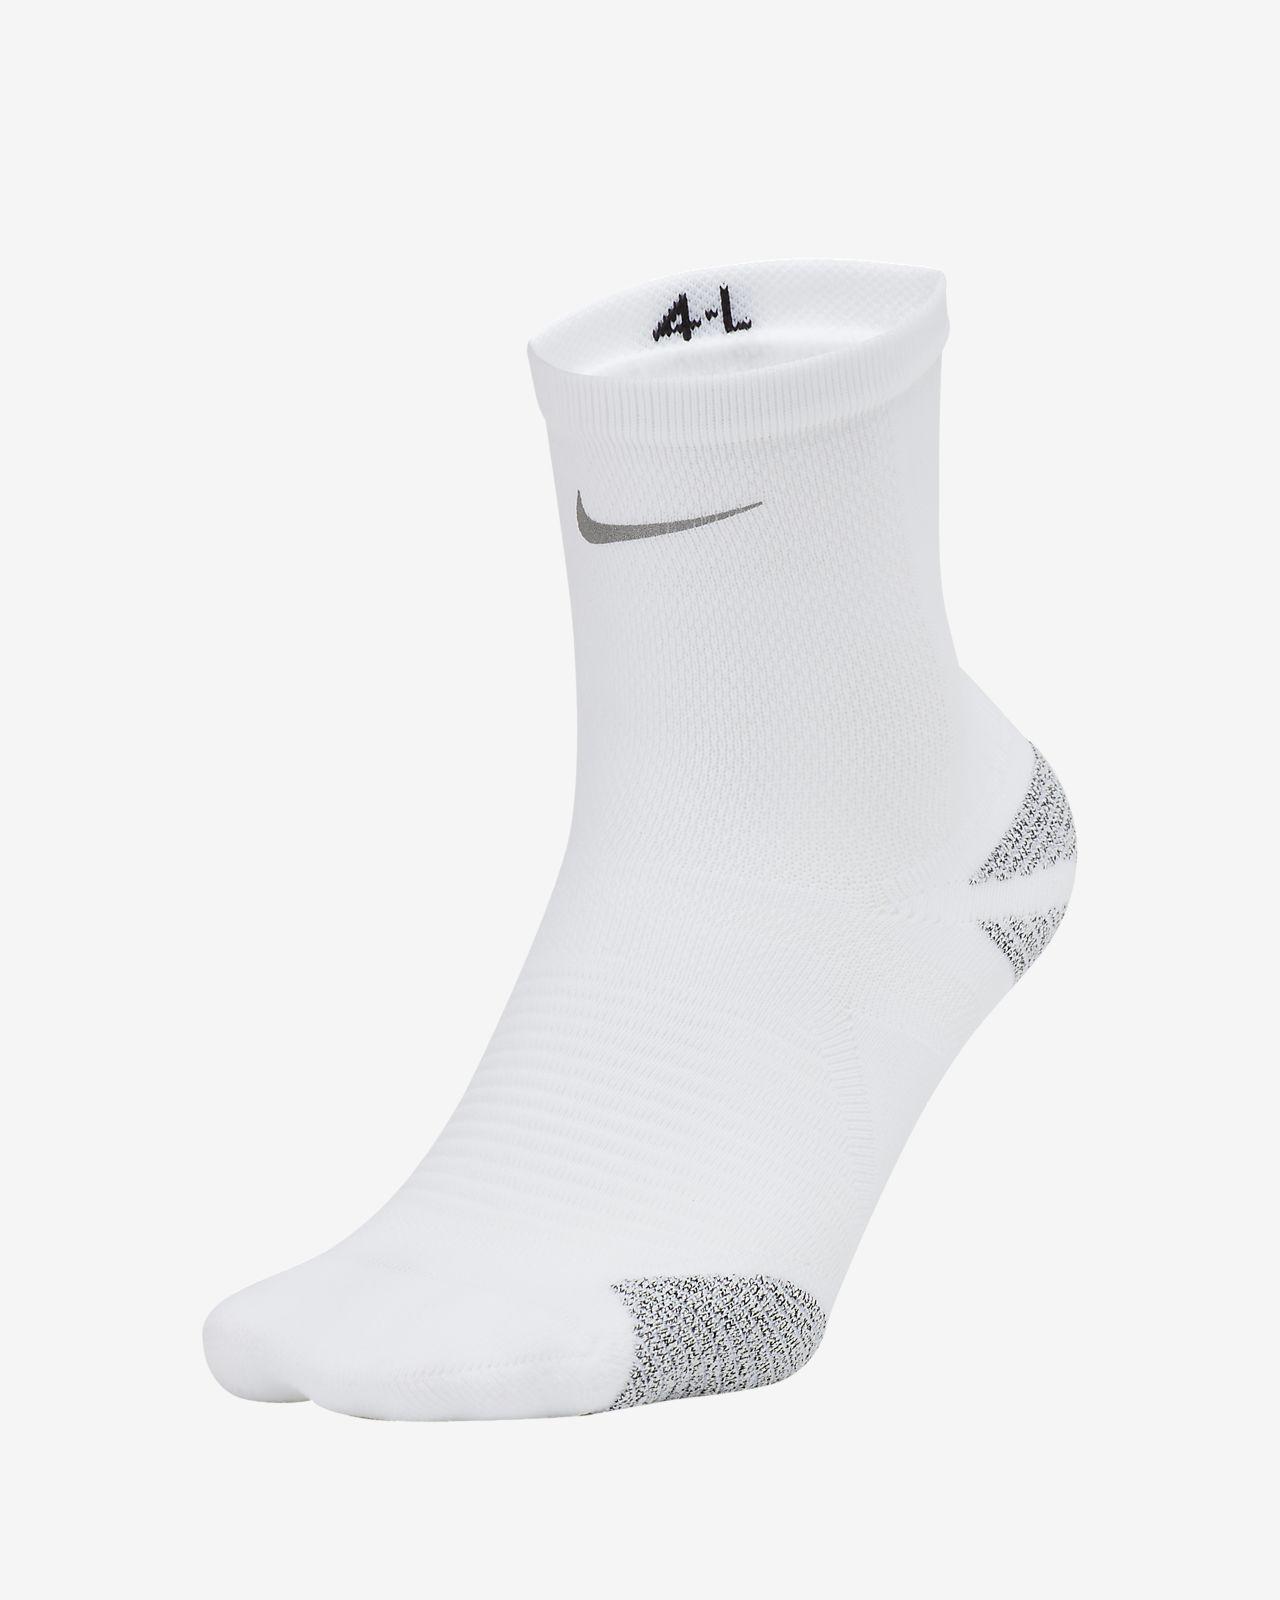 Nike Racing Ankle 运动袜(1 双)